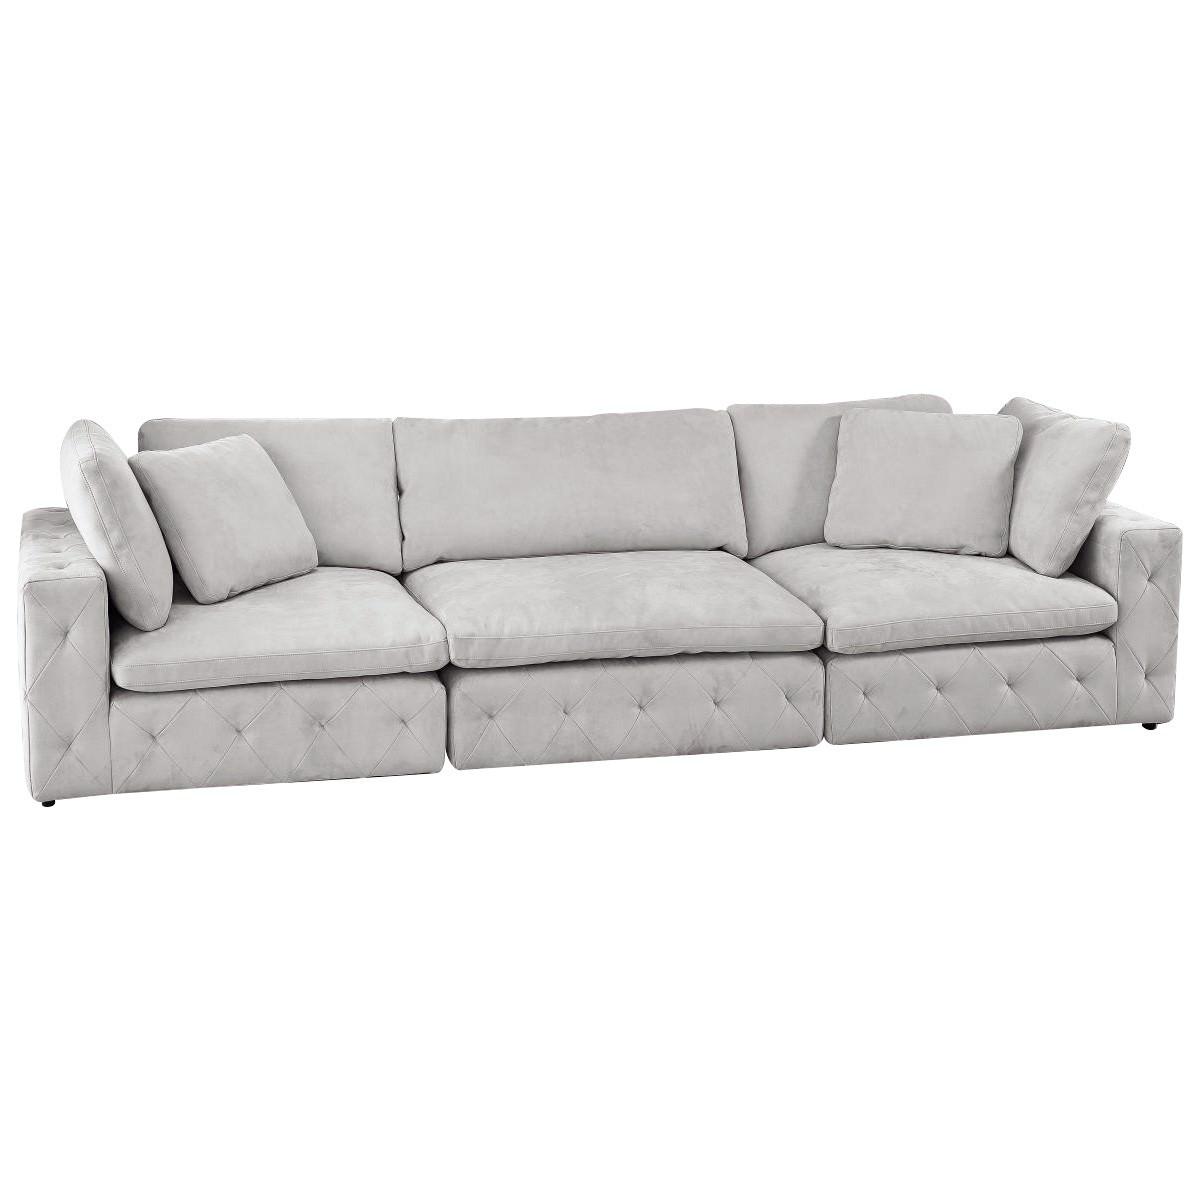 Sammy Fabric Sofa, 3 Seater, Light Grey